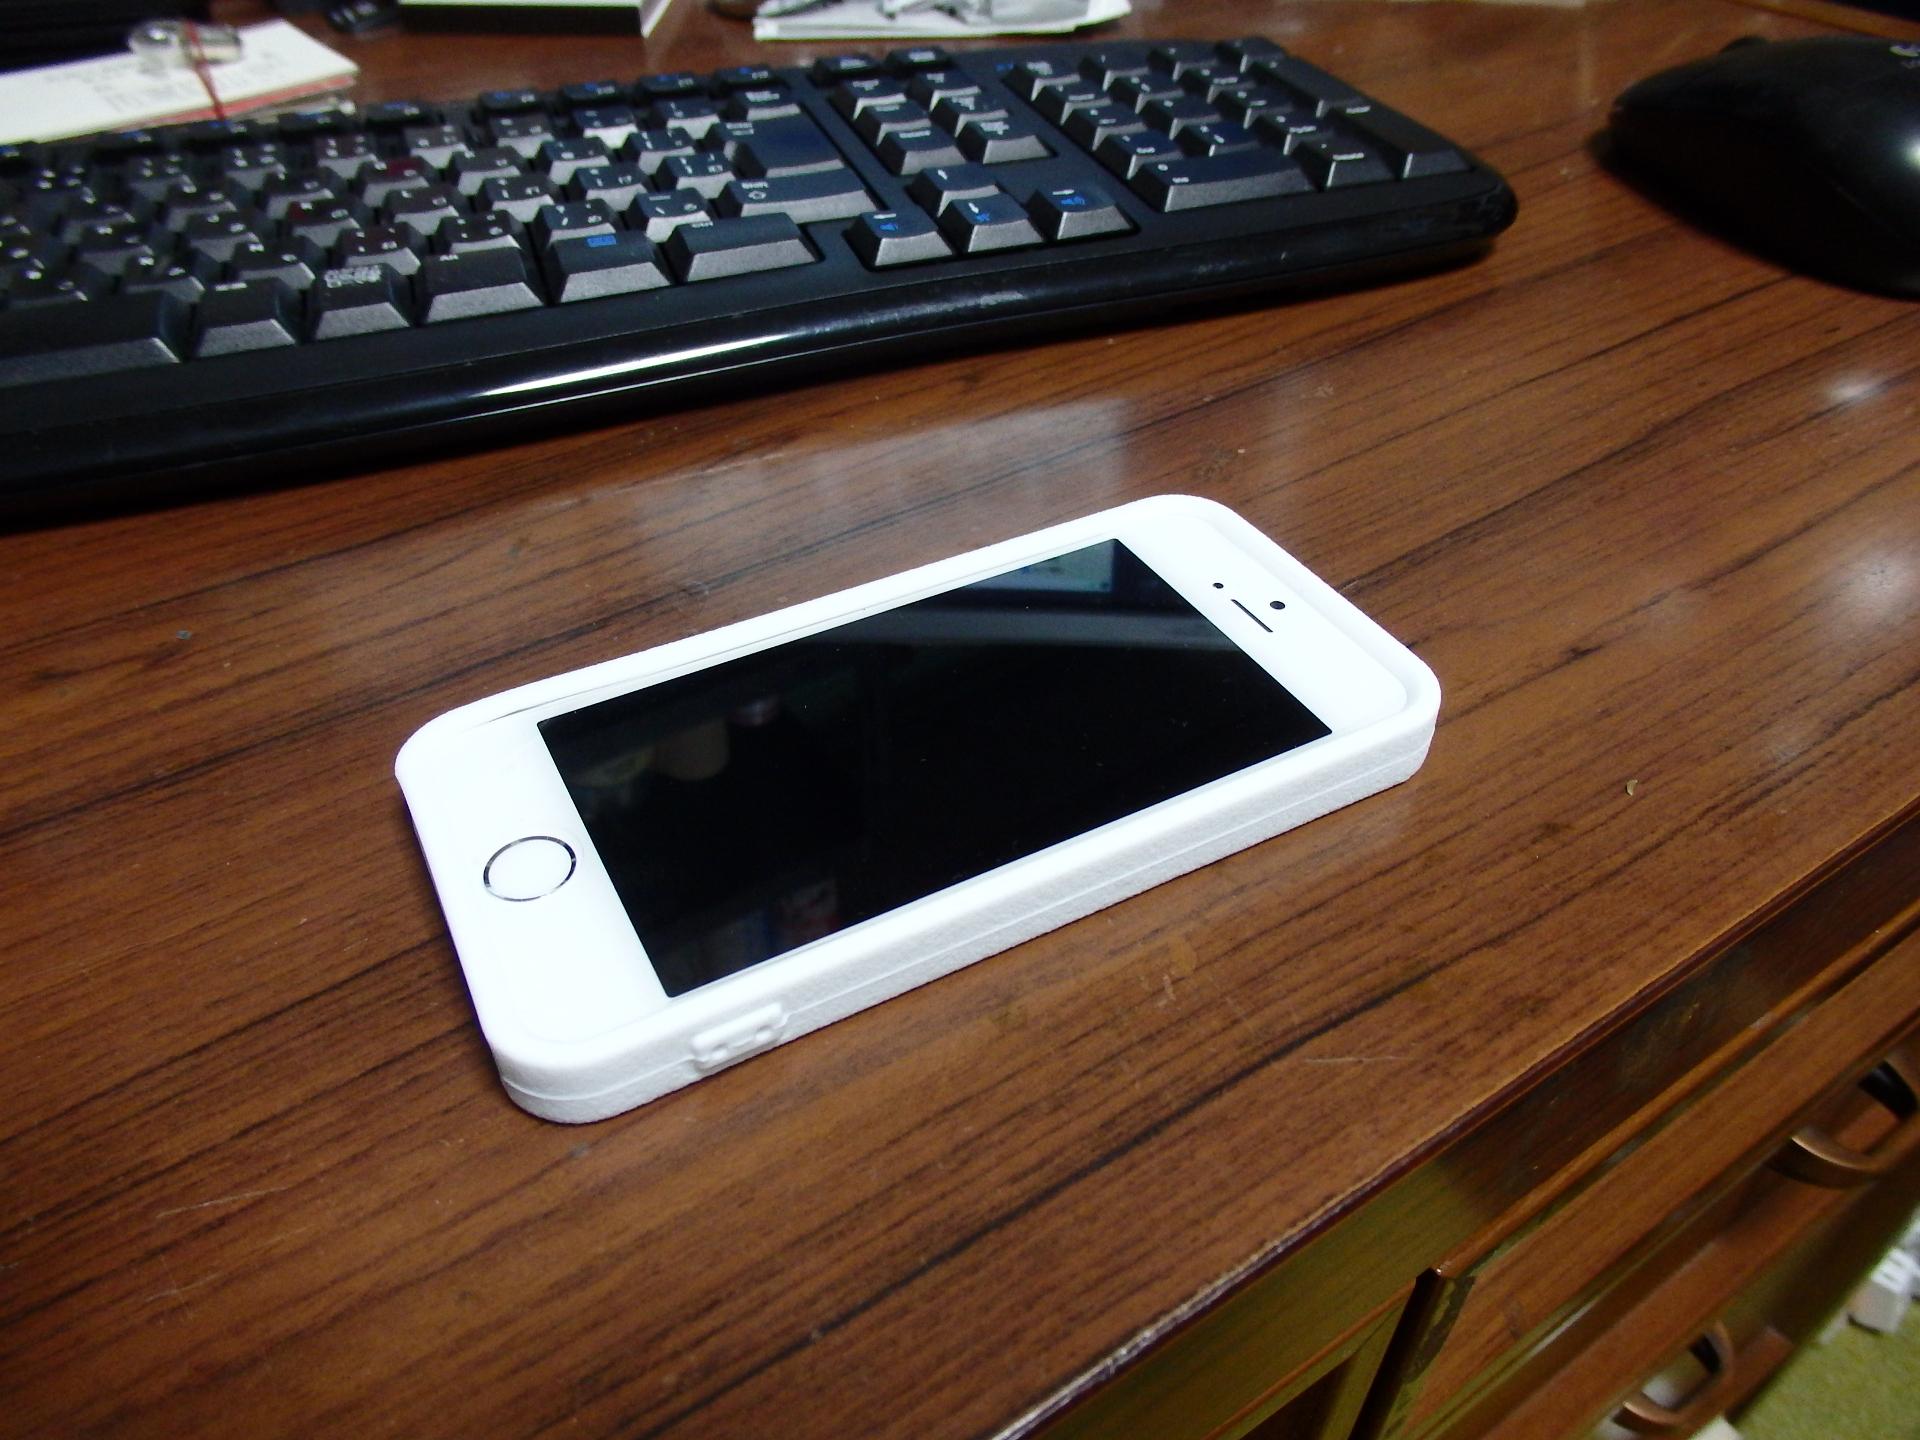 iPhone5Sへの移行作業が完了。